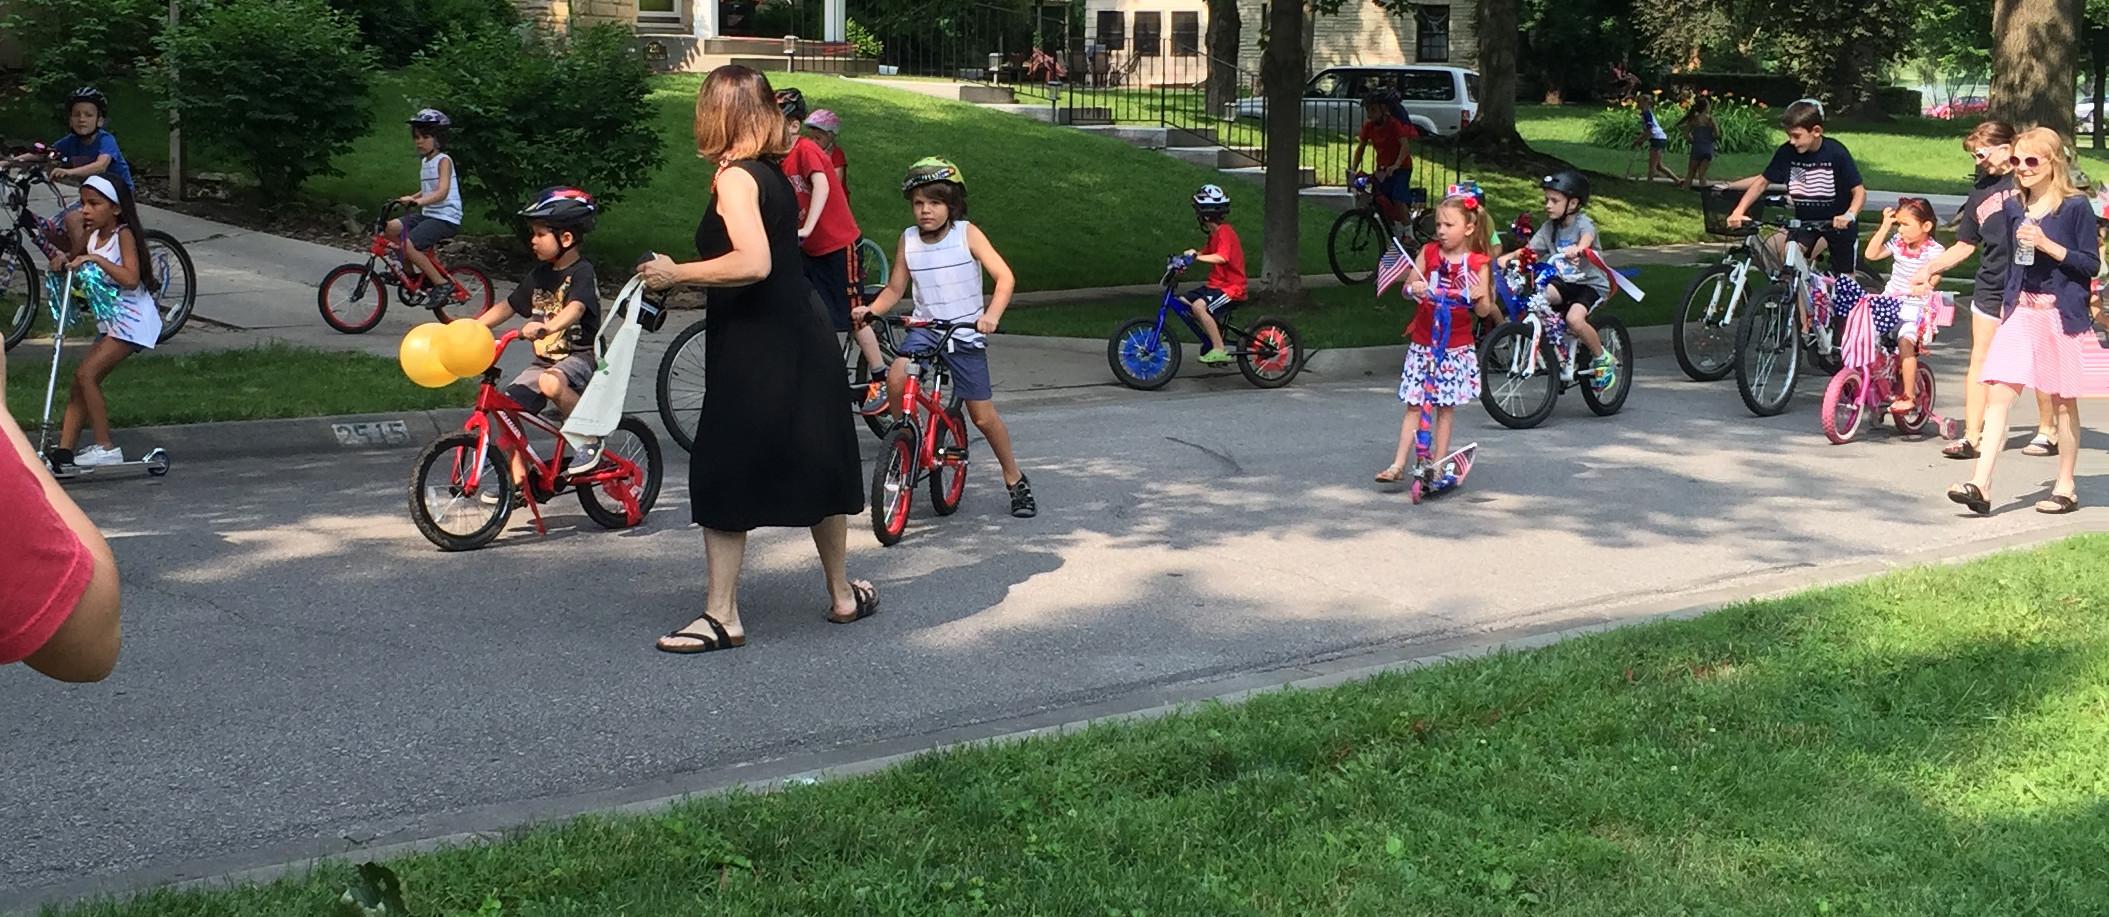 July 4, 2015 Woodsdale Islands Parade